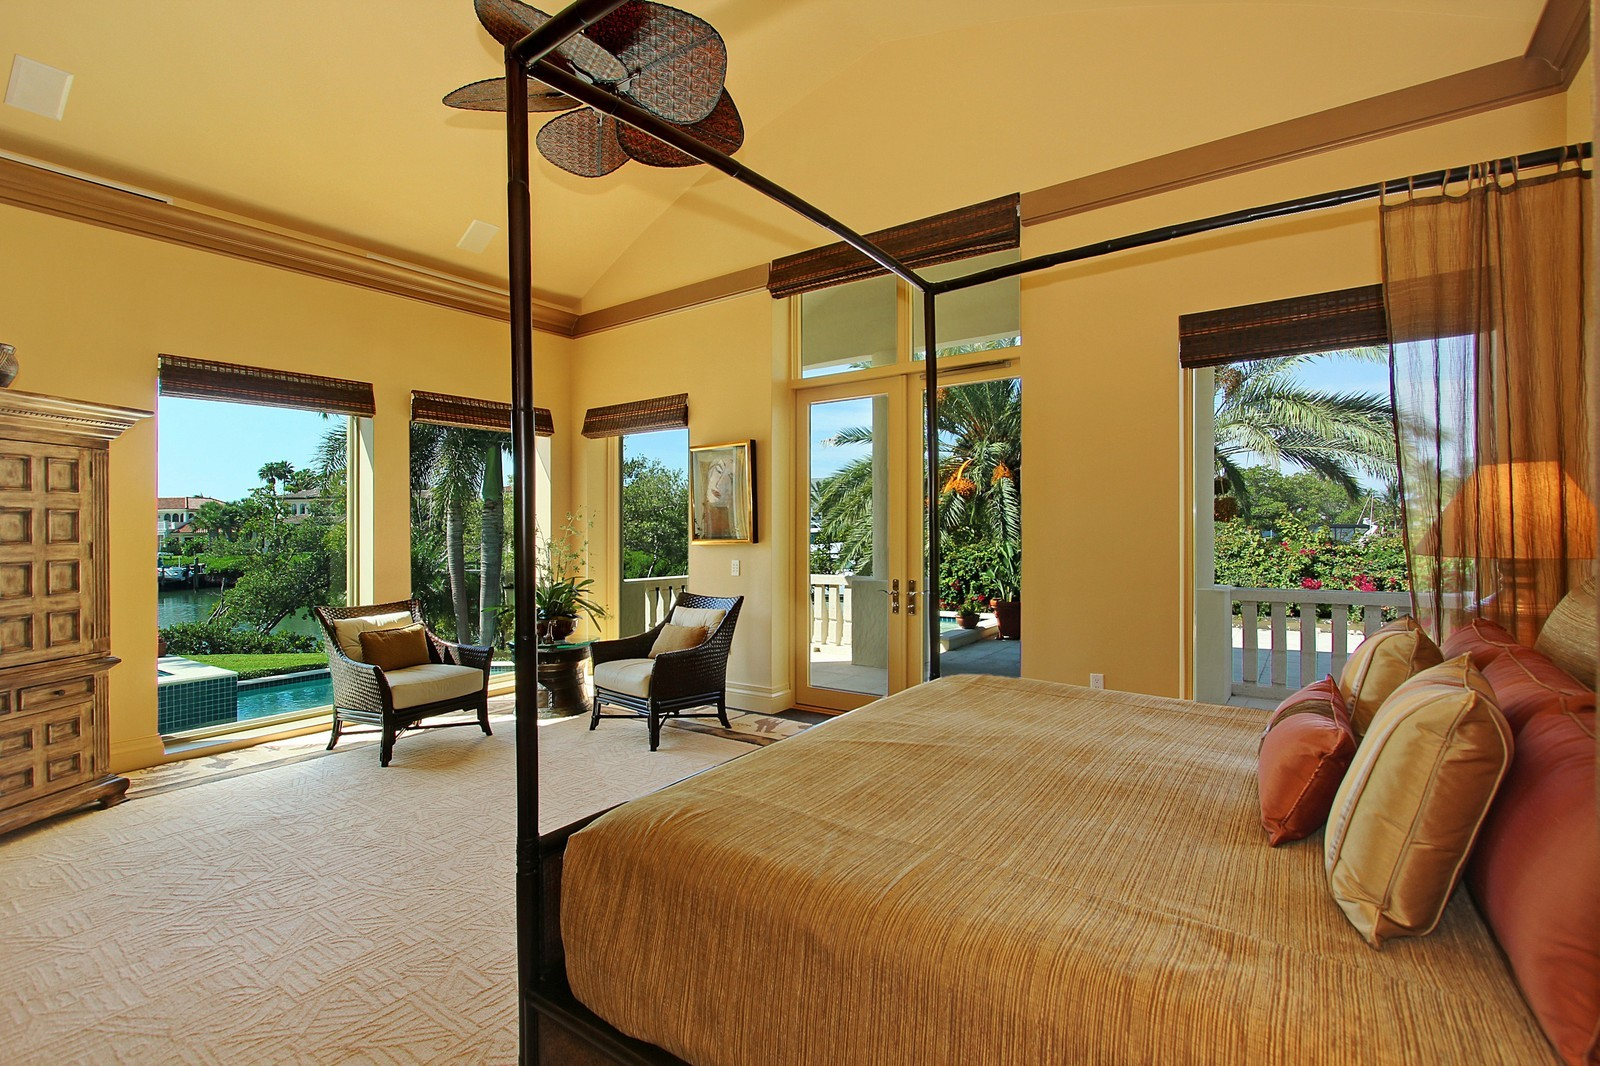 Real Estate Photography - 6814 SE Isle Way, Stuart, FL, 34996 - Master Bedroom 2